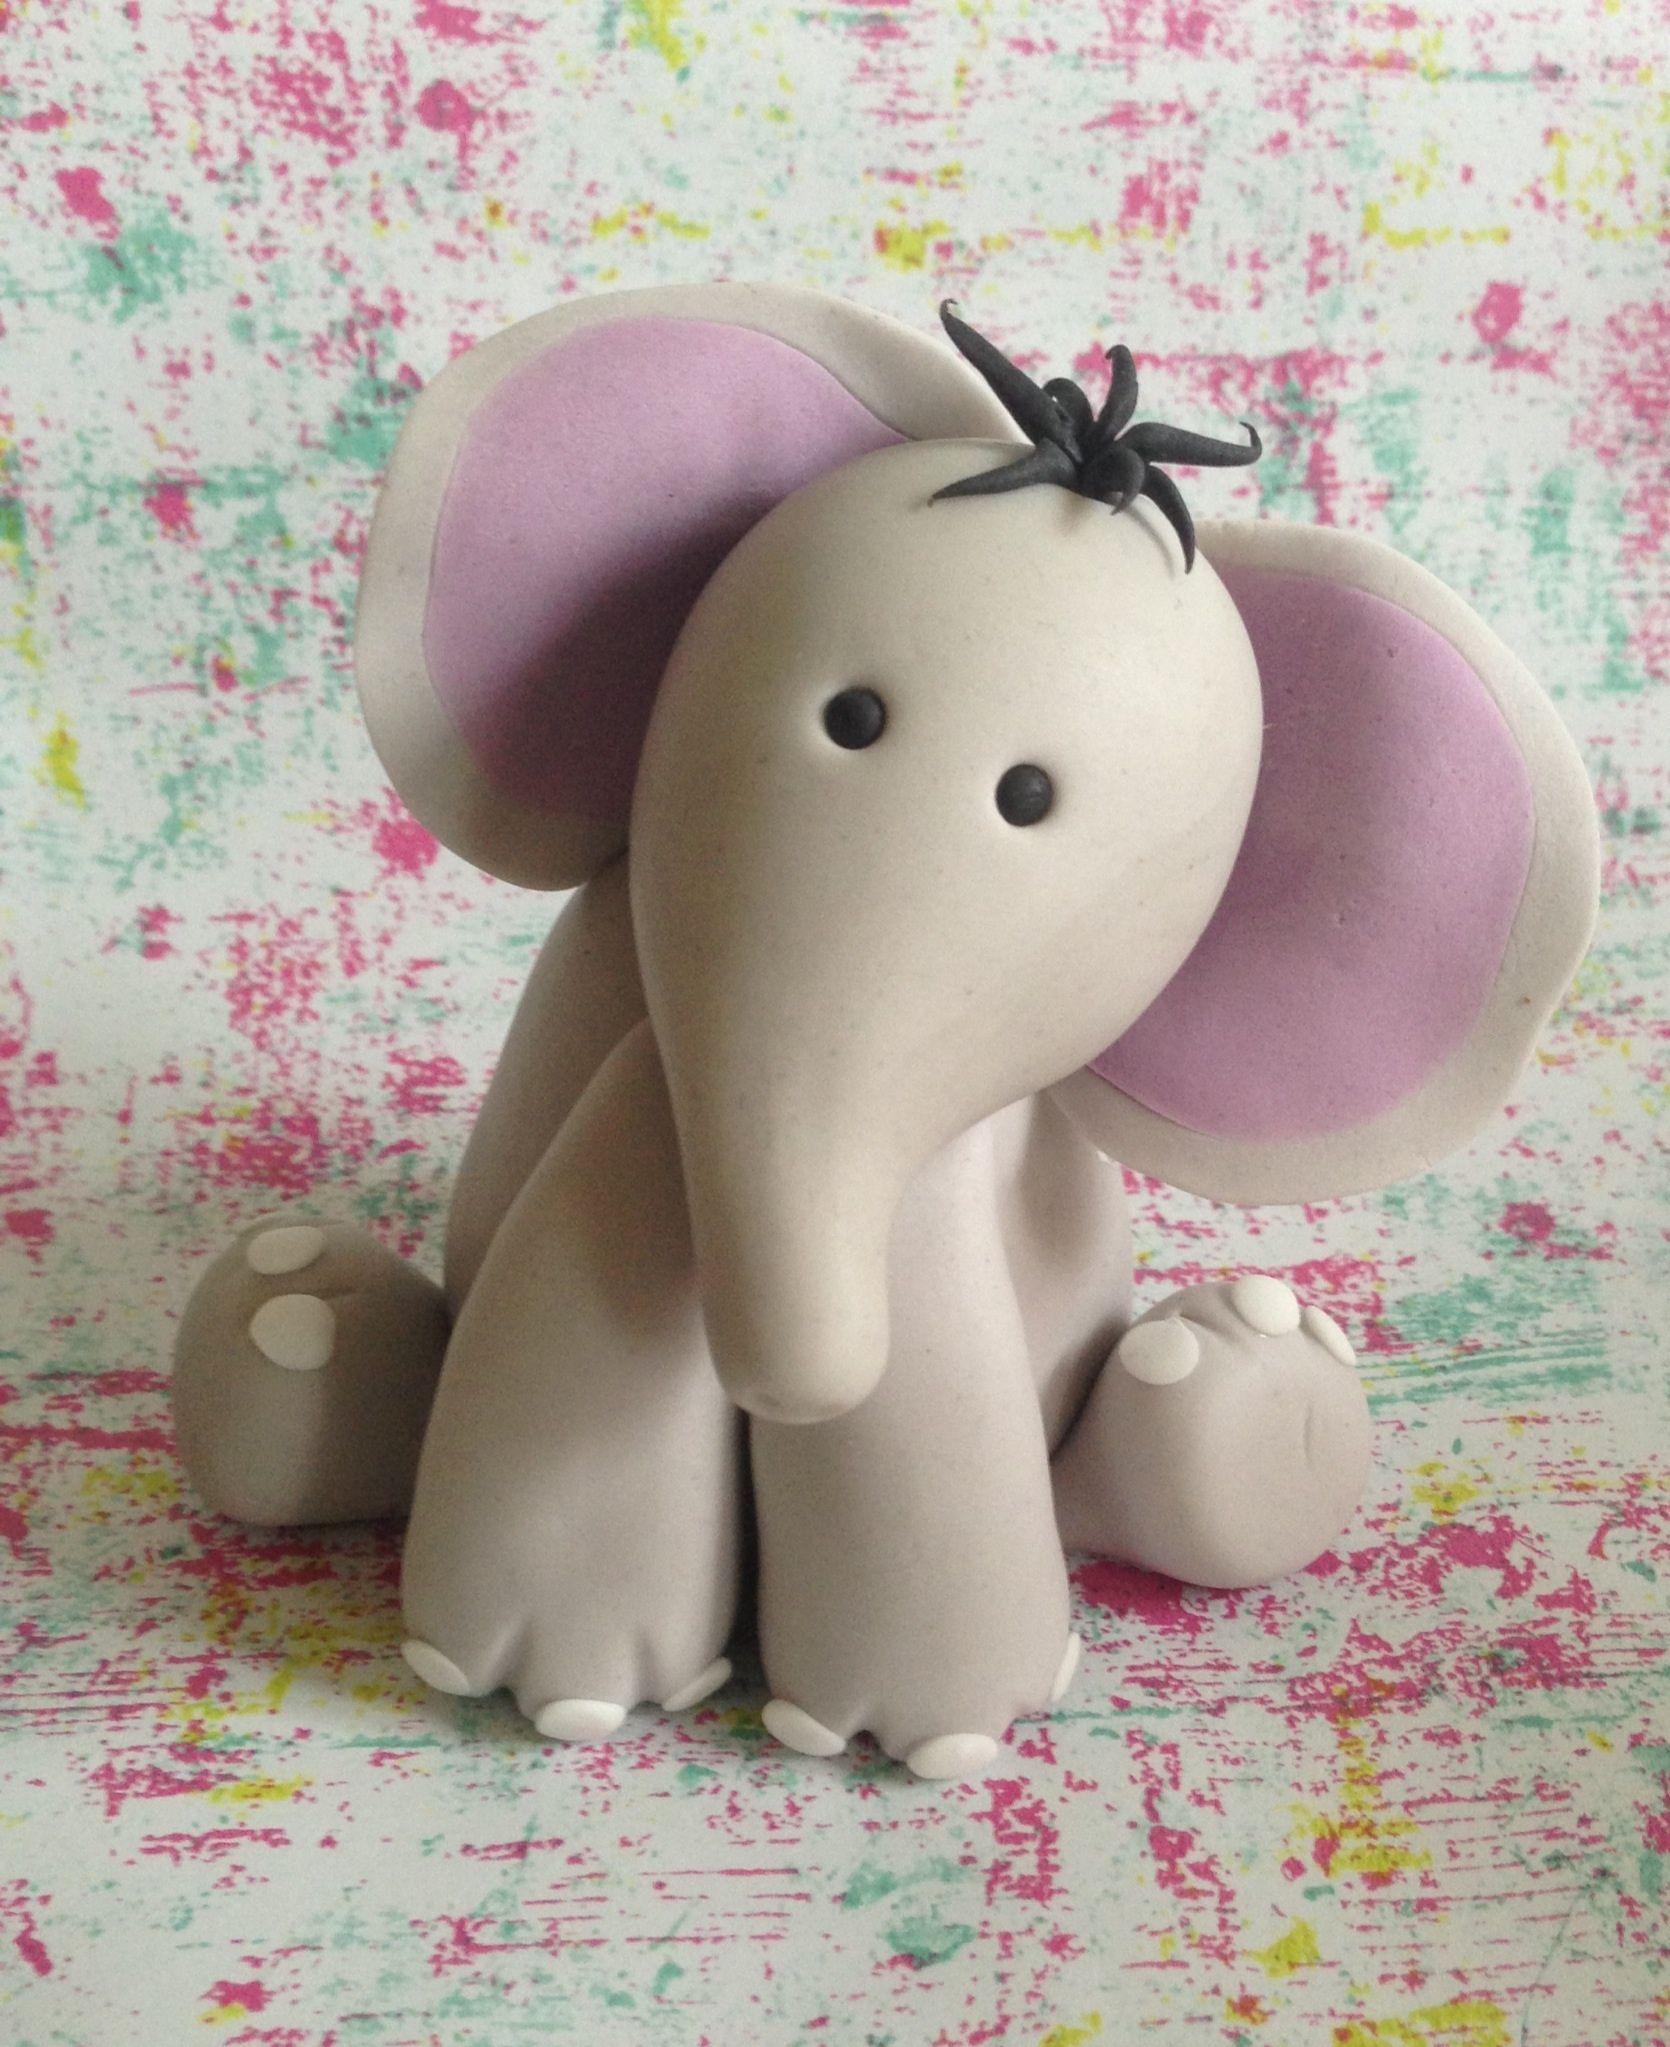 3D Figures - Gum paste baby elephant cake topper